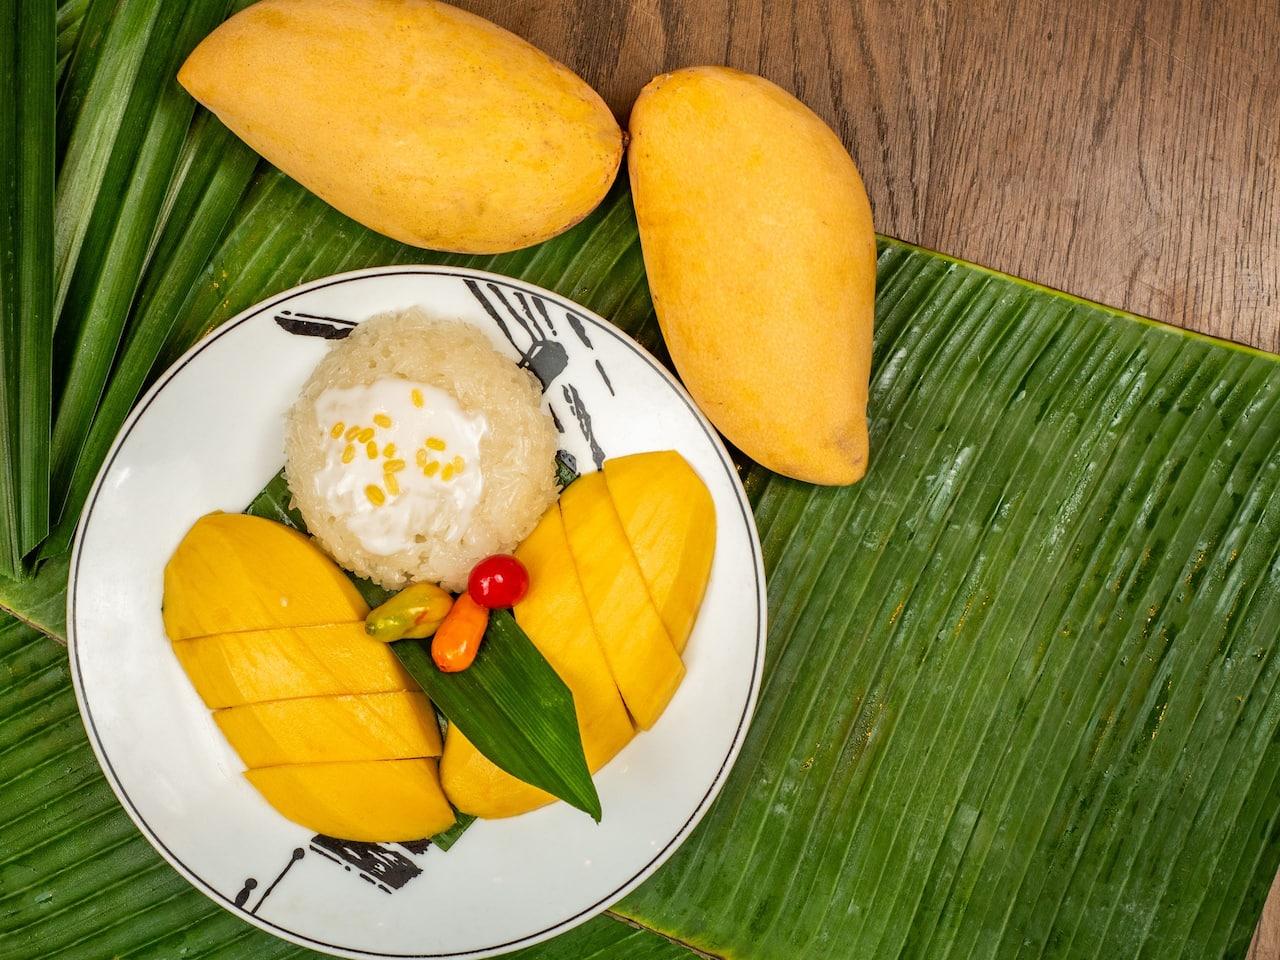 Mango Sticky Rice - Grand Hyatt Erawan Bangkok